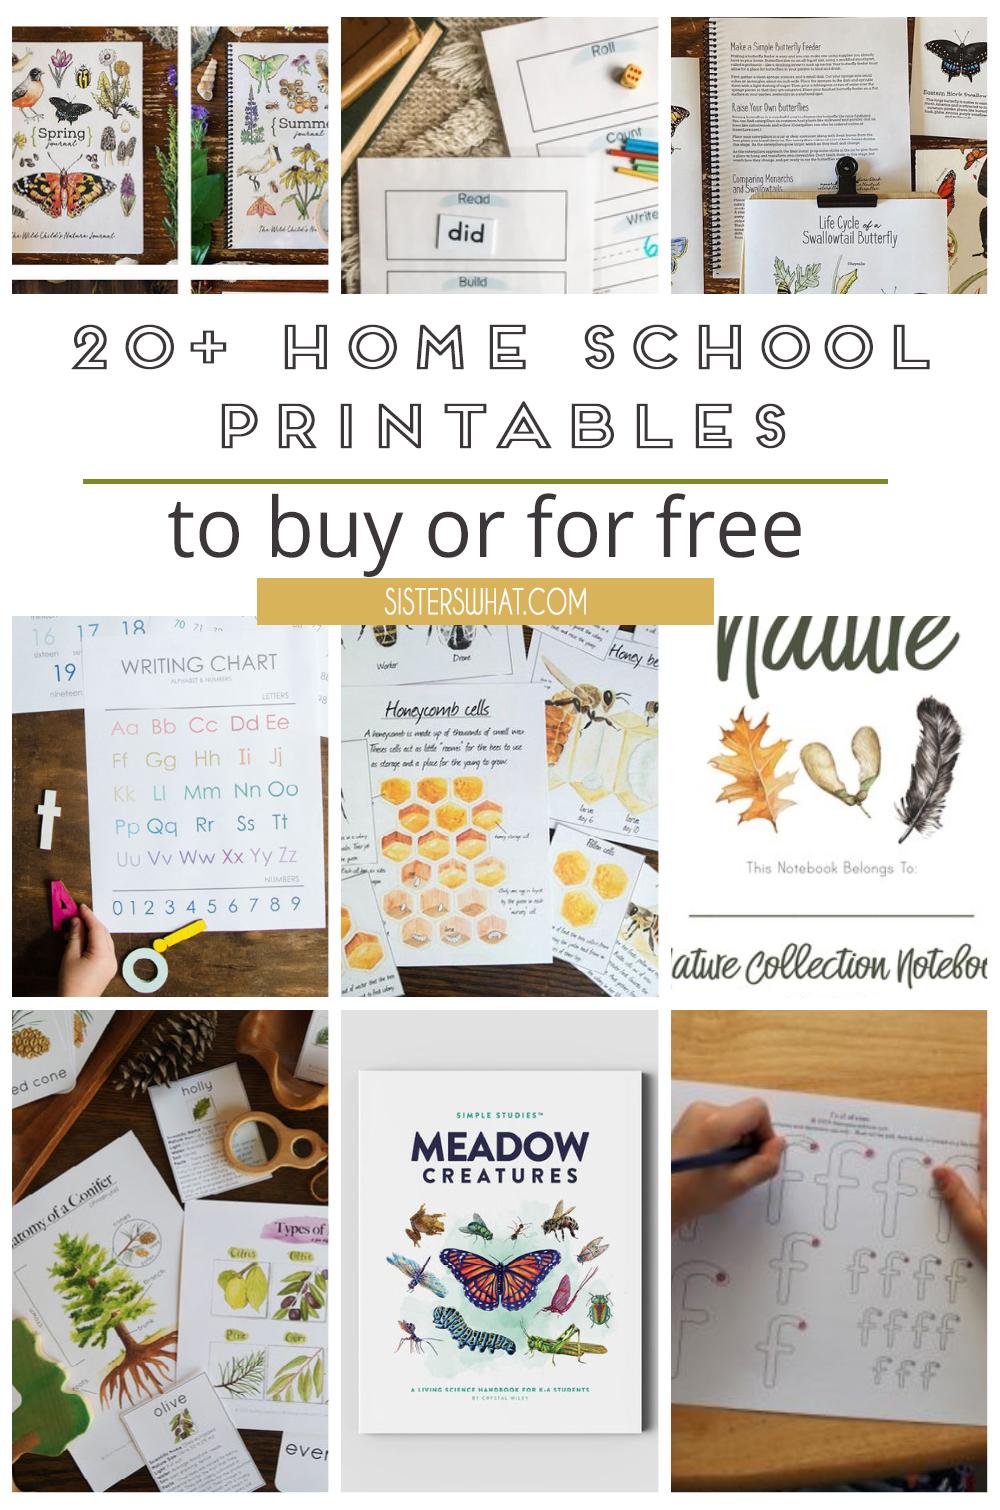 homeschool printables for nature study